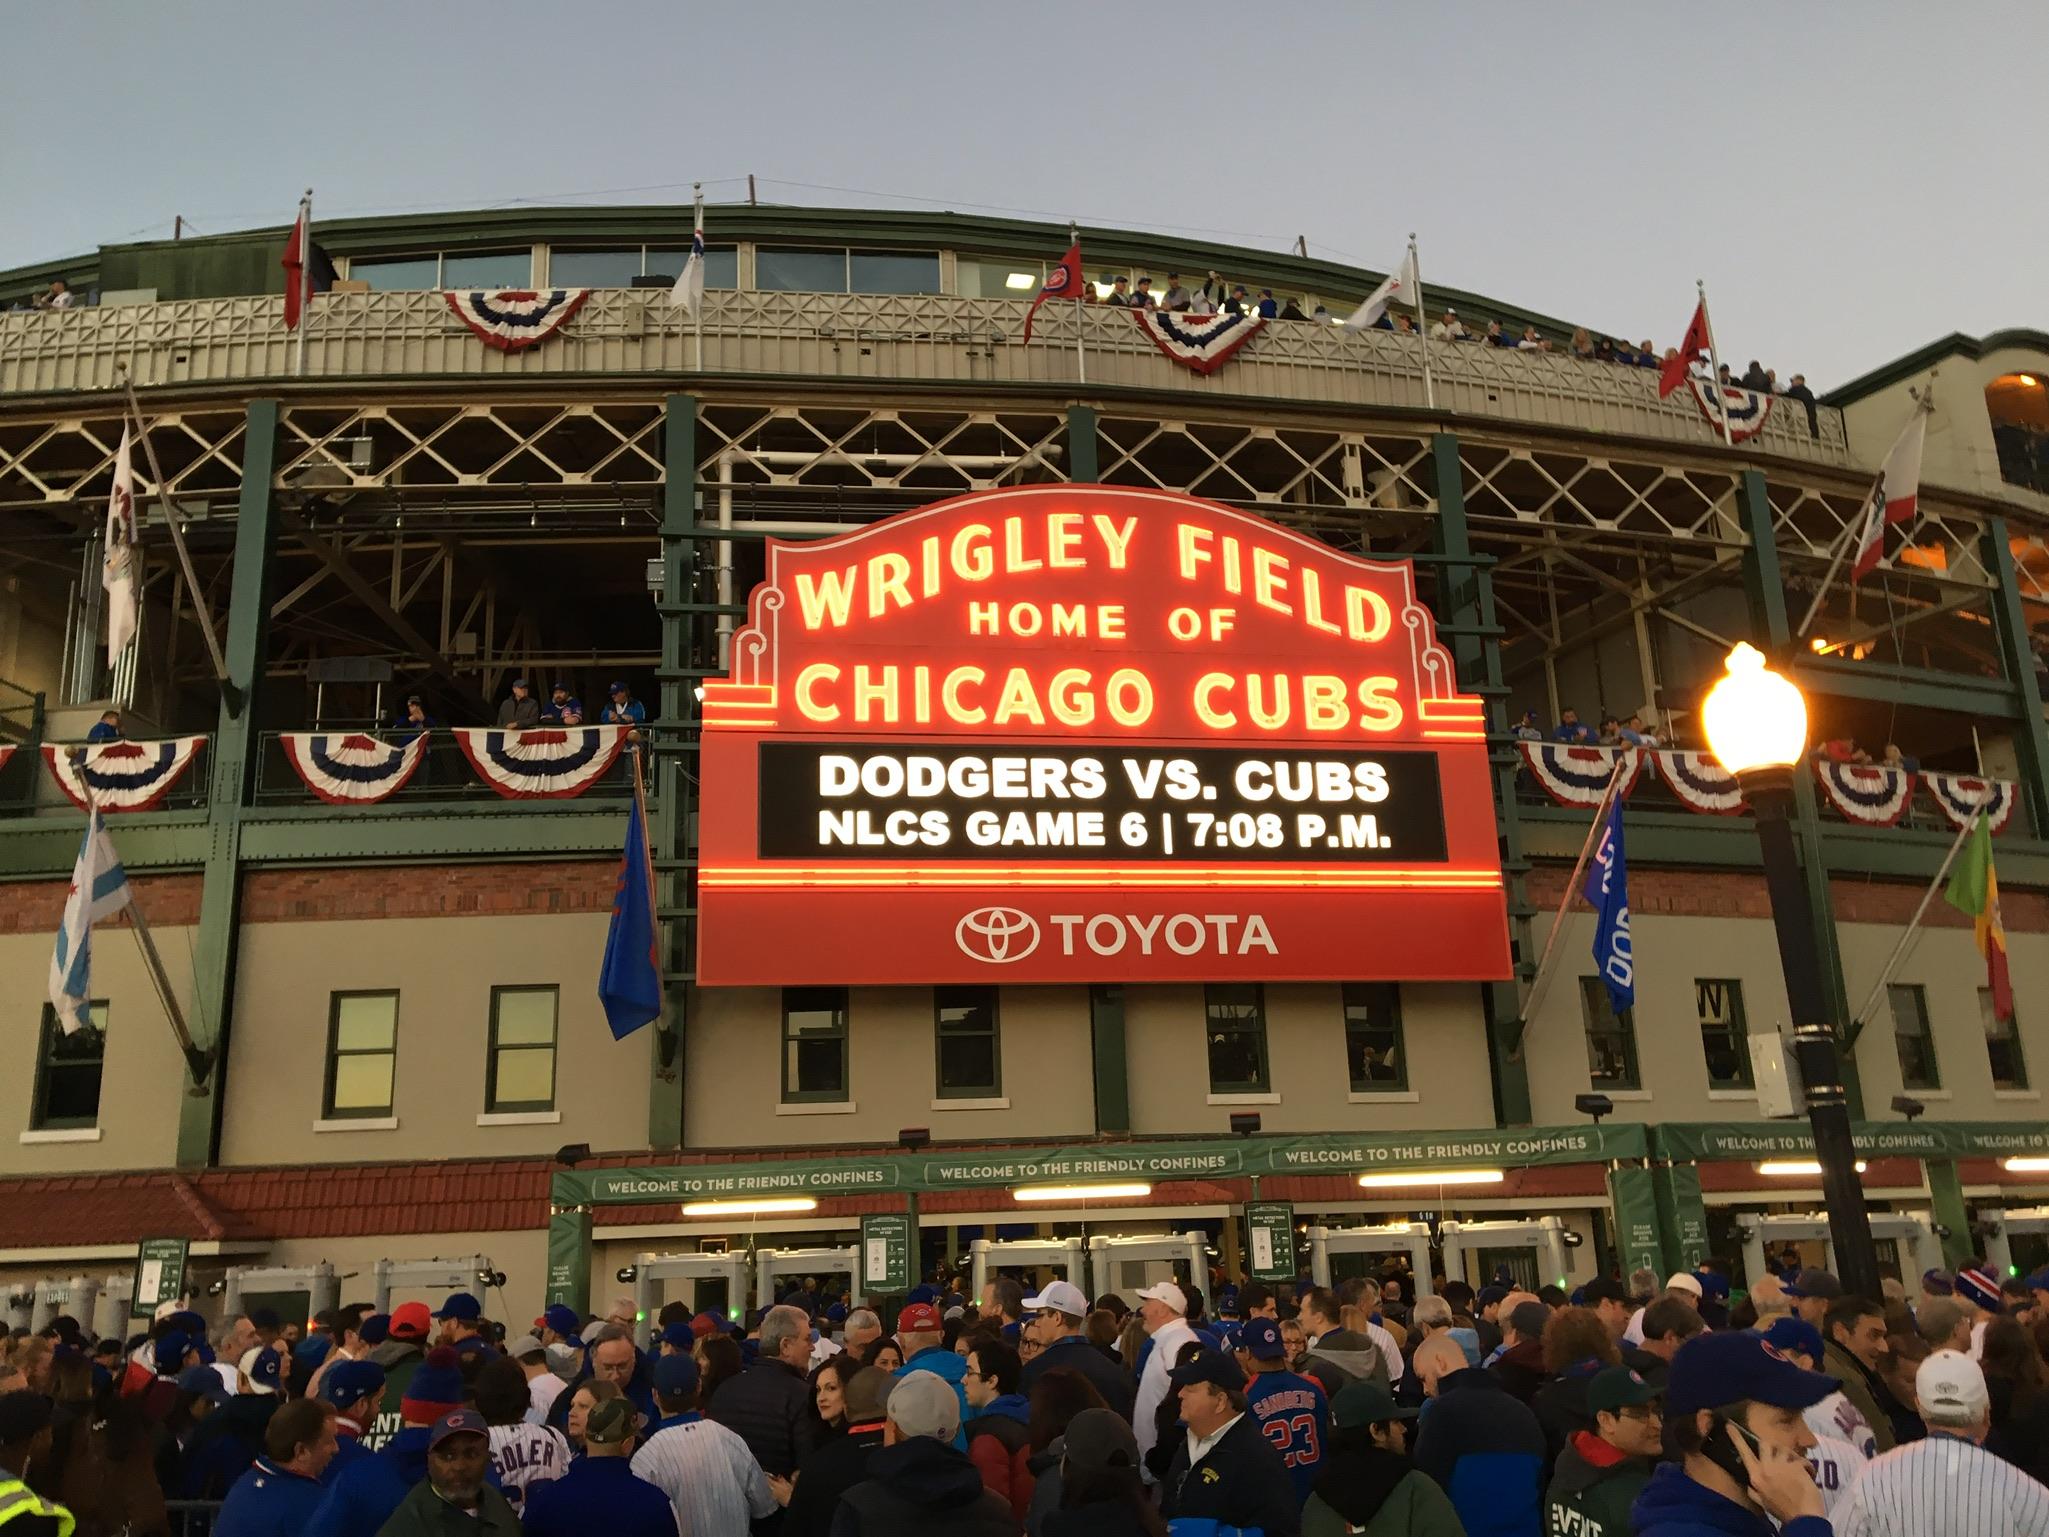 Bernies Tap  Grill Across From Wrigley Field - Chicago map showing wrigley field